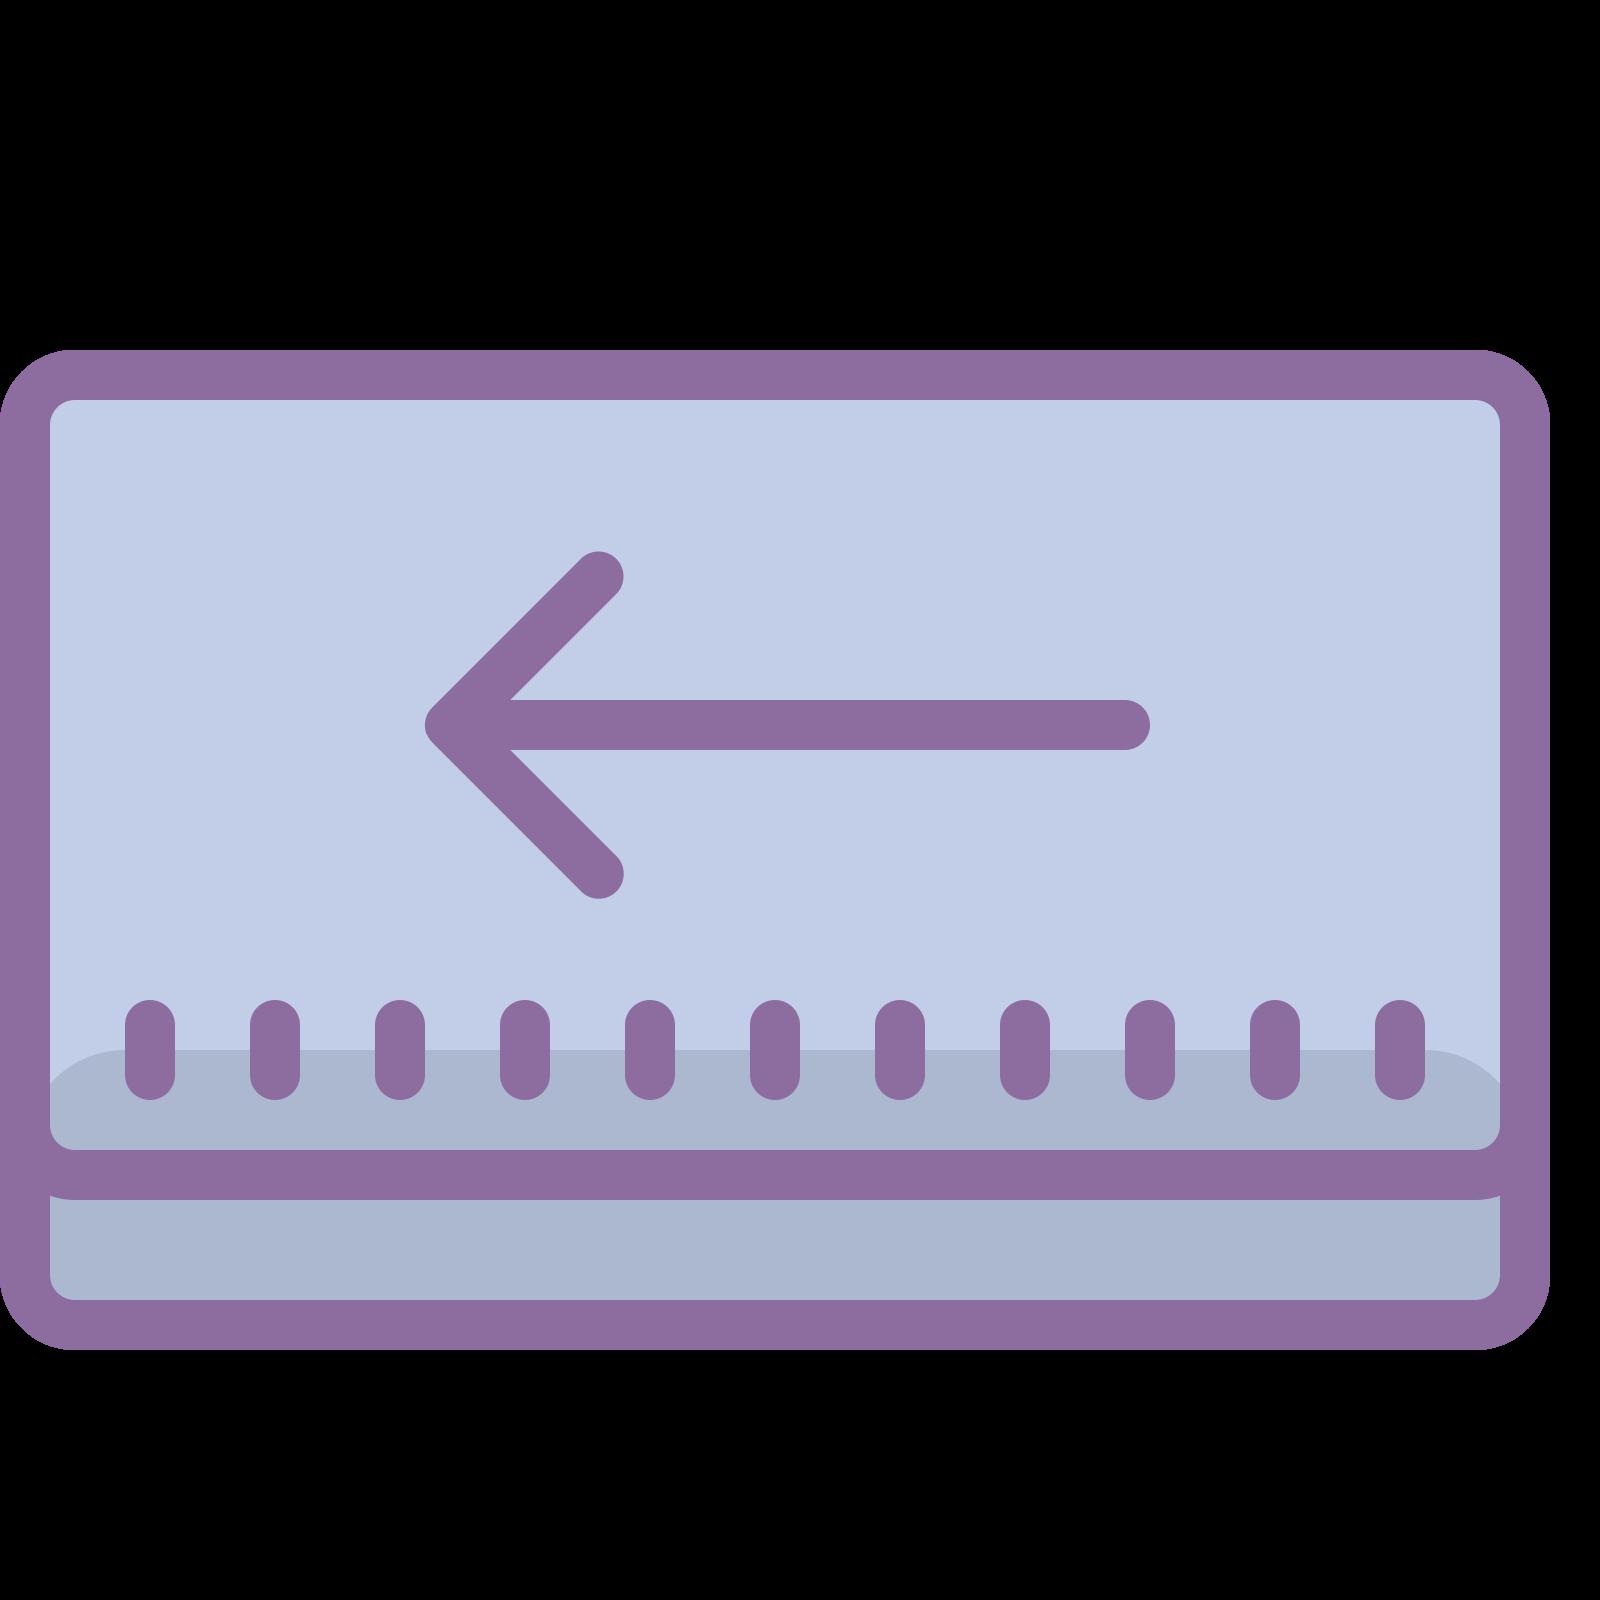 Backspace icon